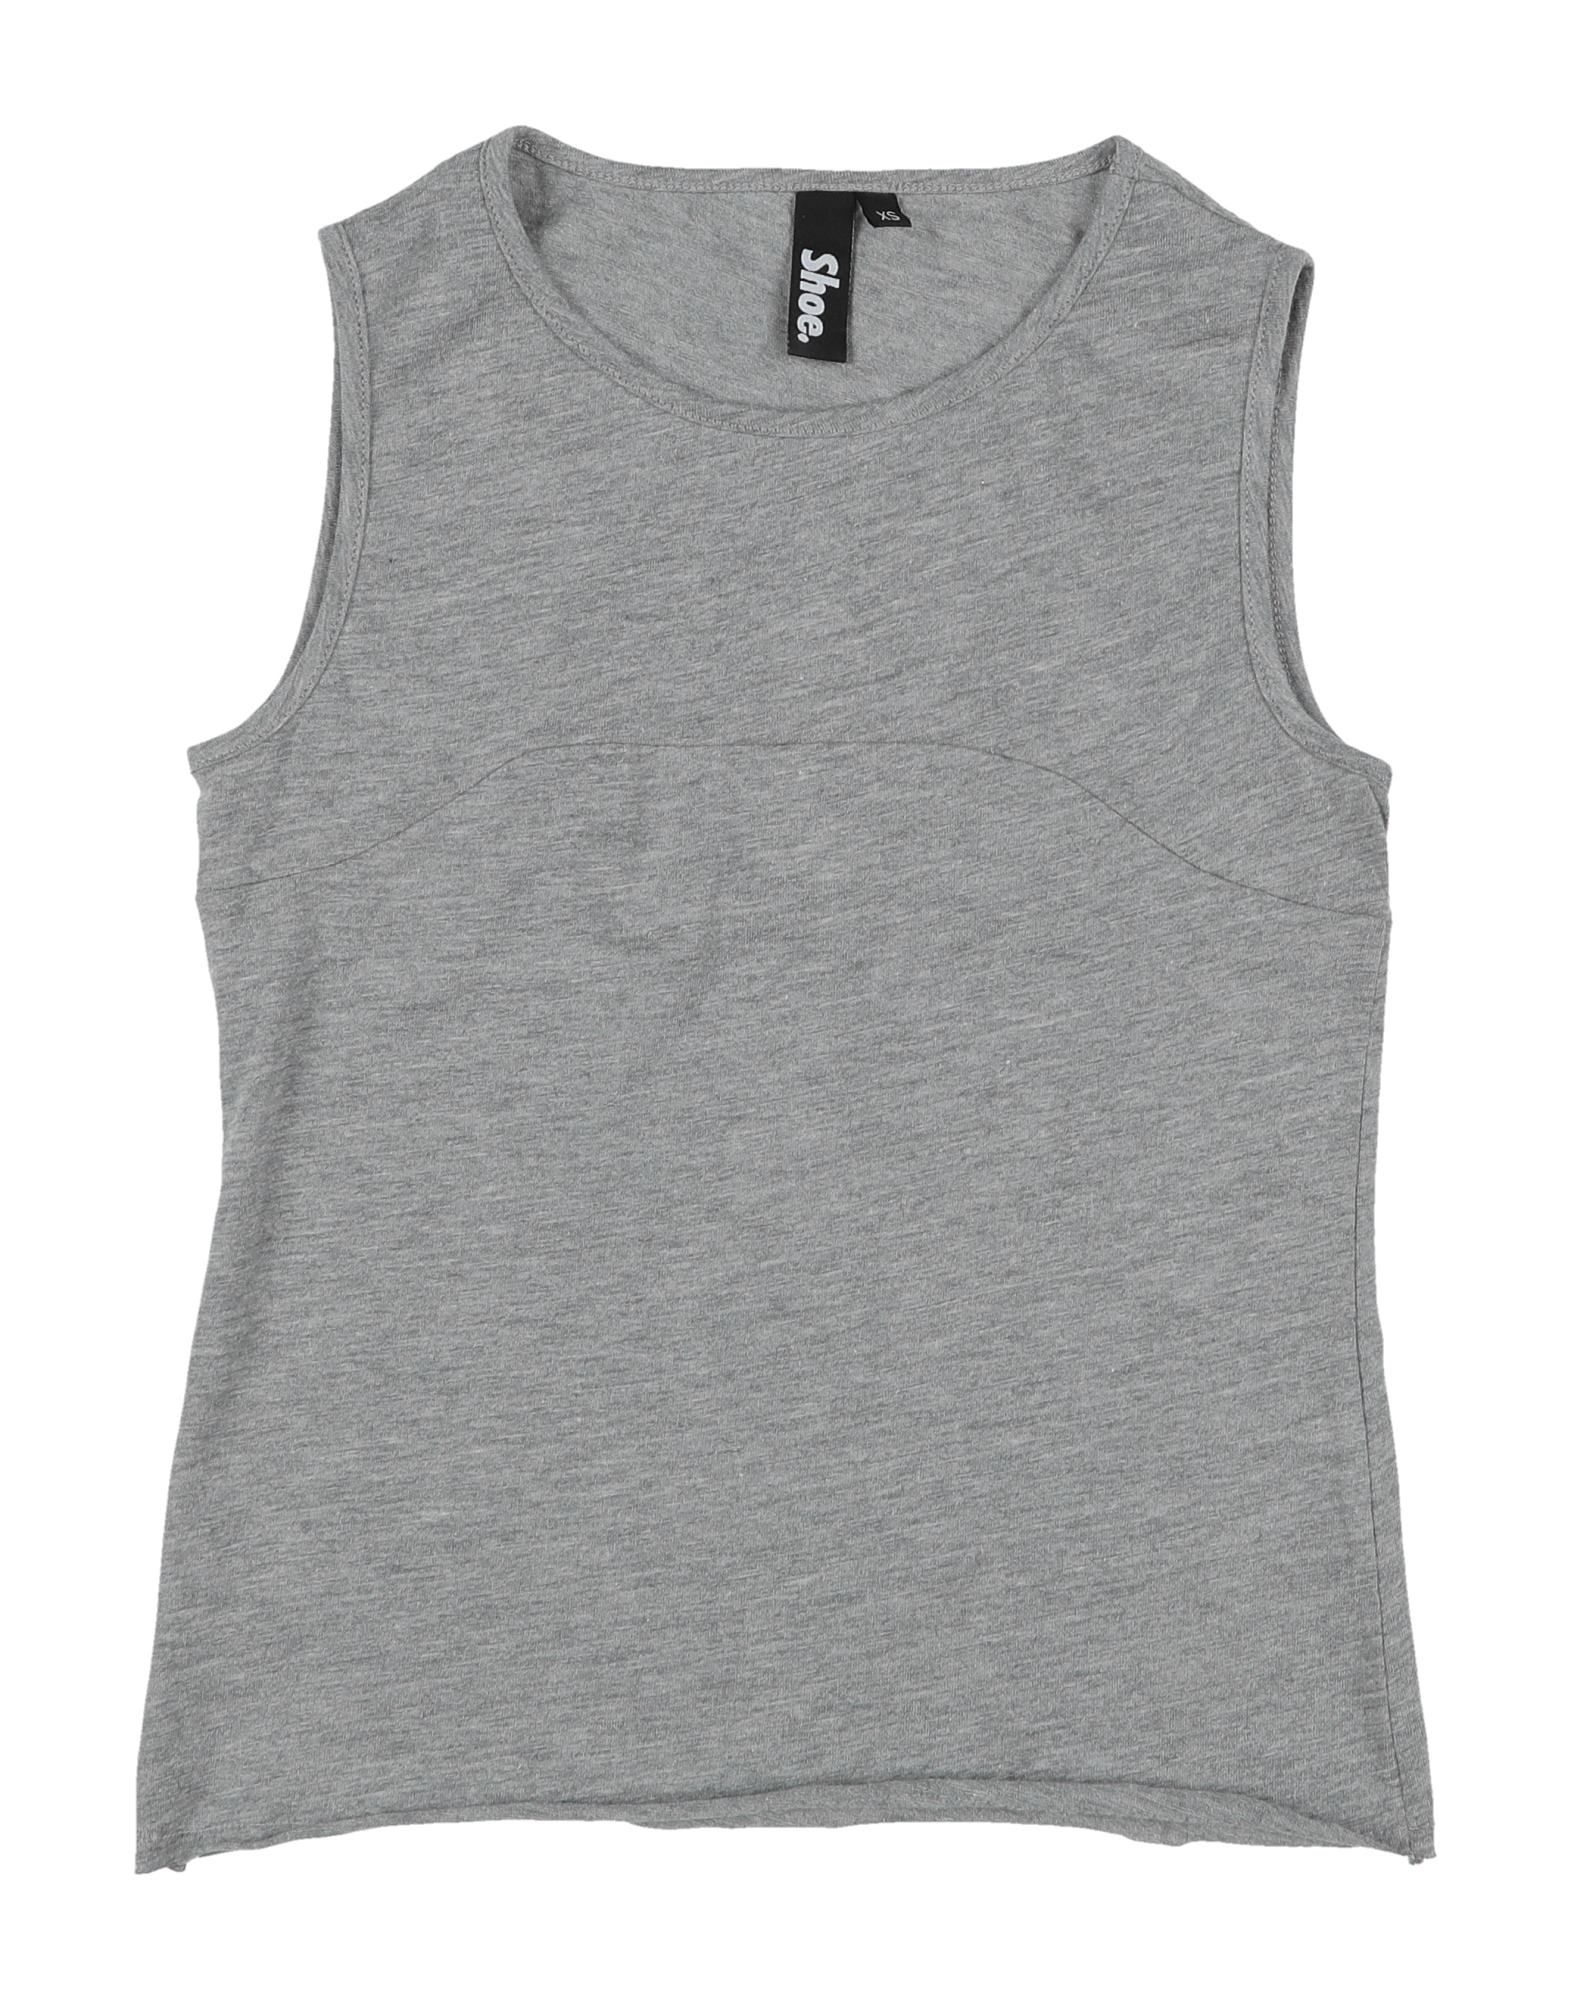 Shoeshine Kids' T-shirts In Grey